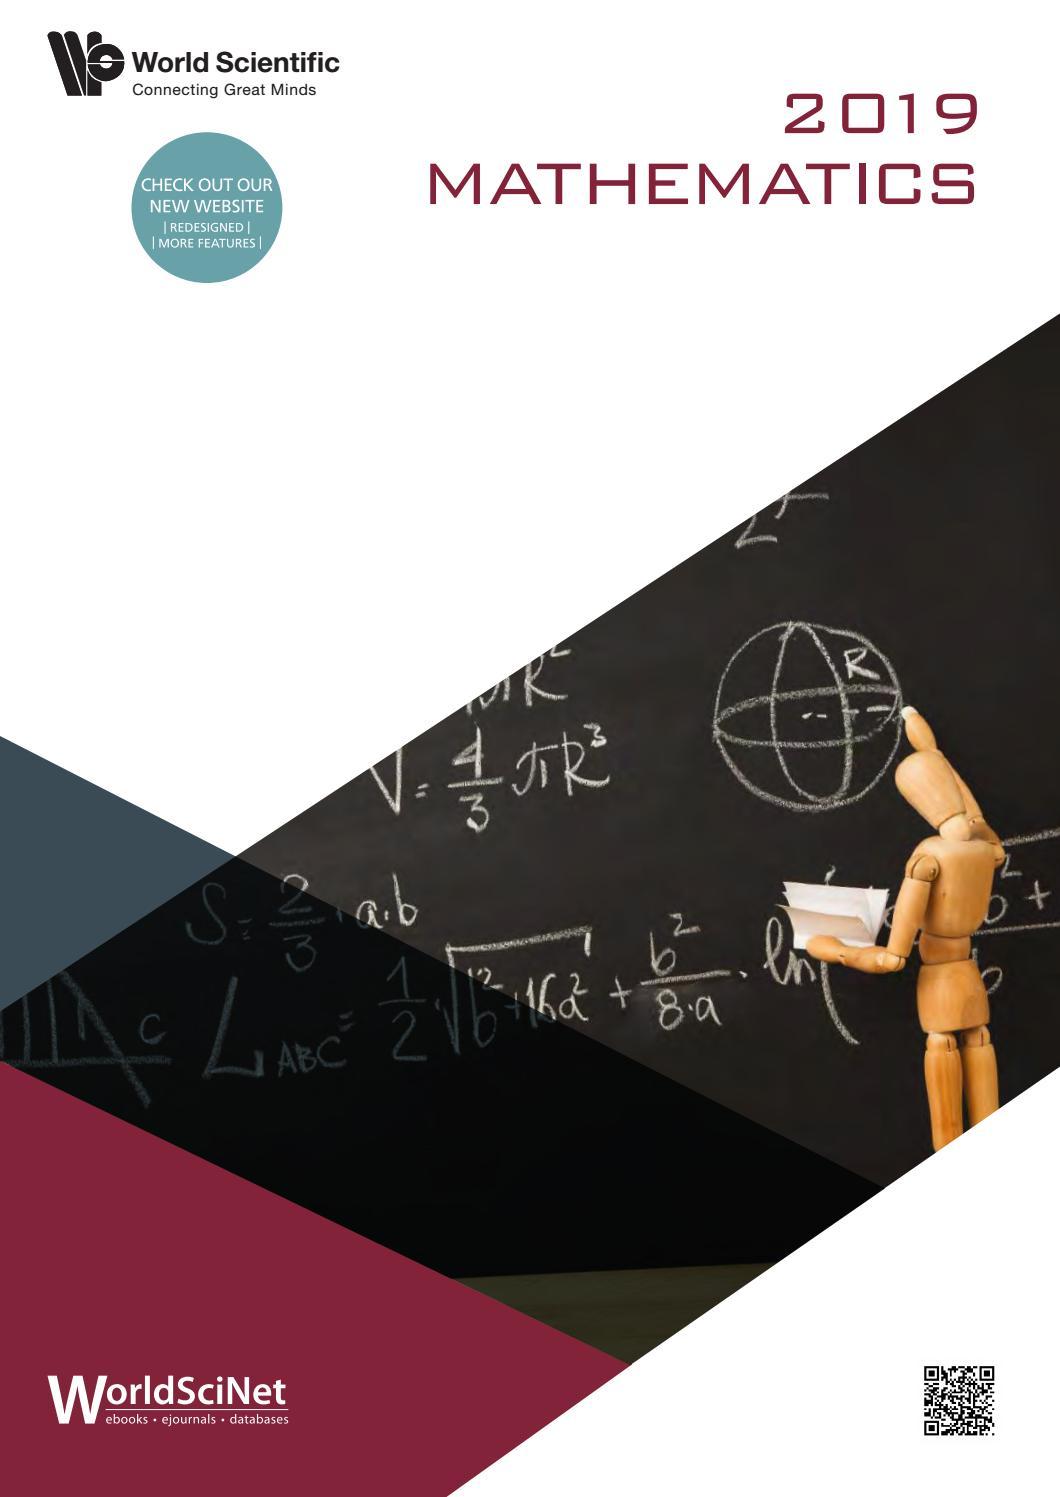 WS_math_2019 by SCIENTIFIC BOOKS INFORMATION - issuu